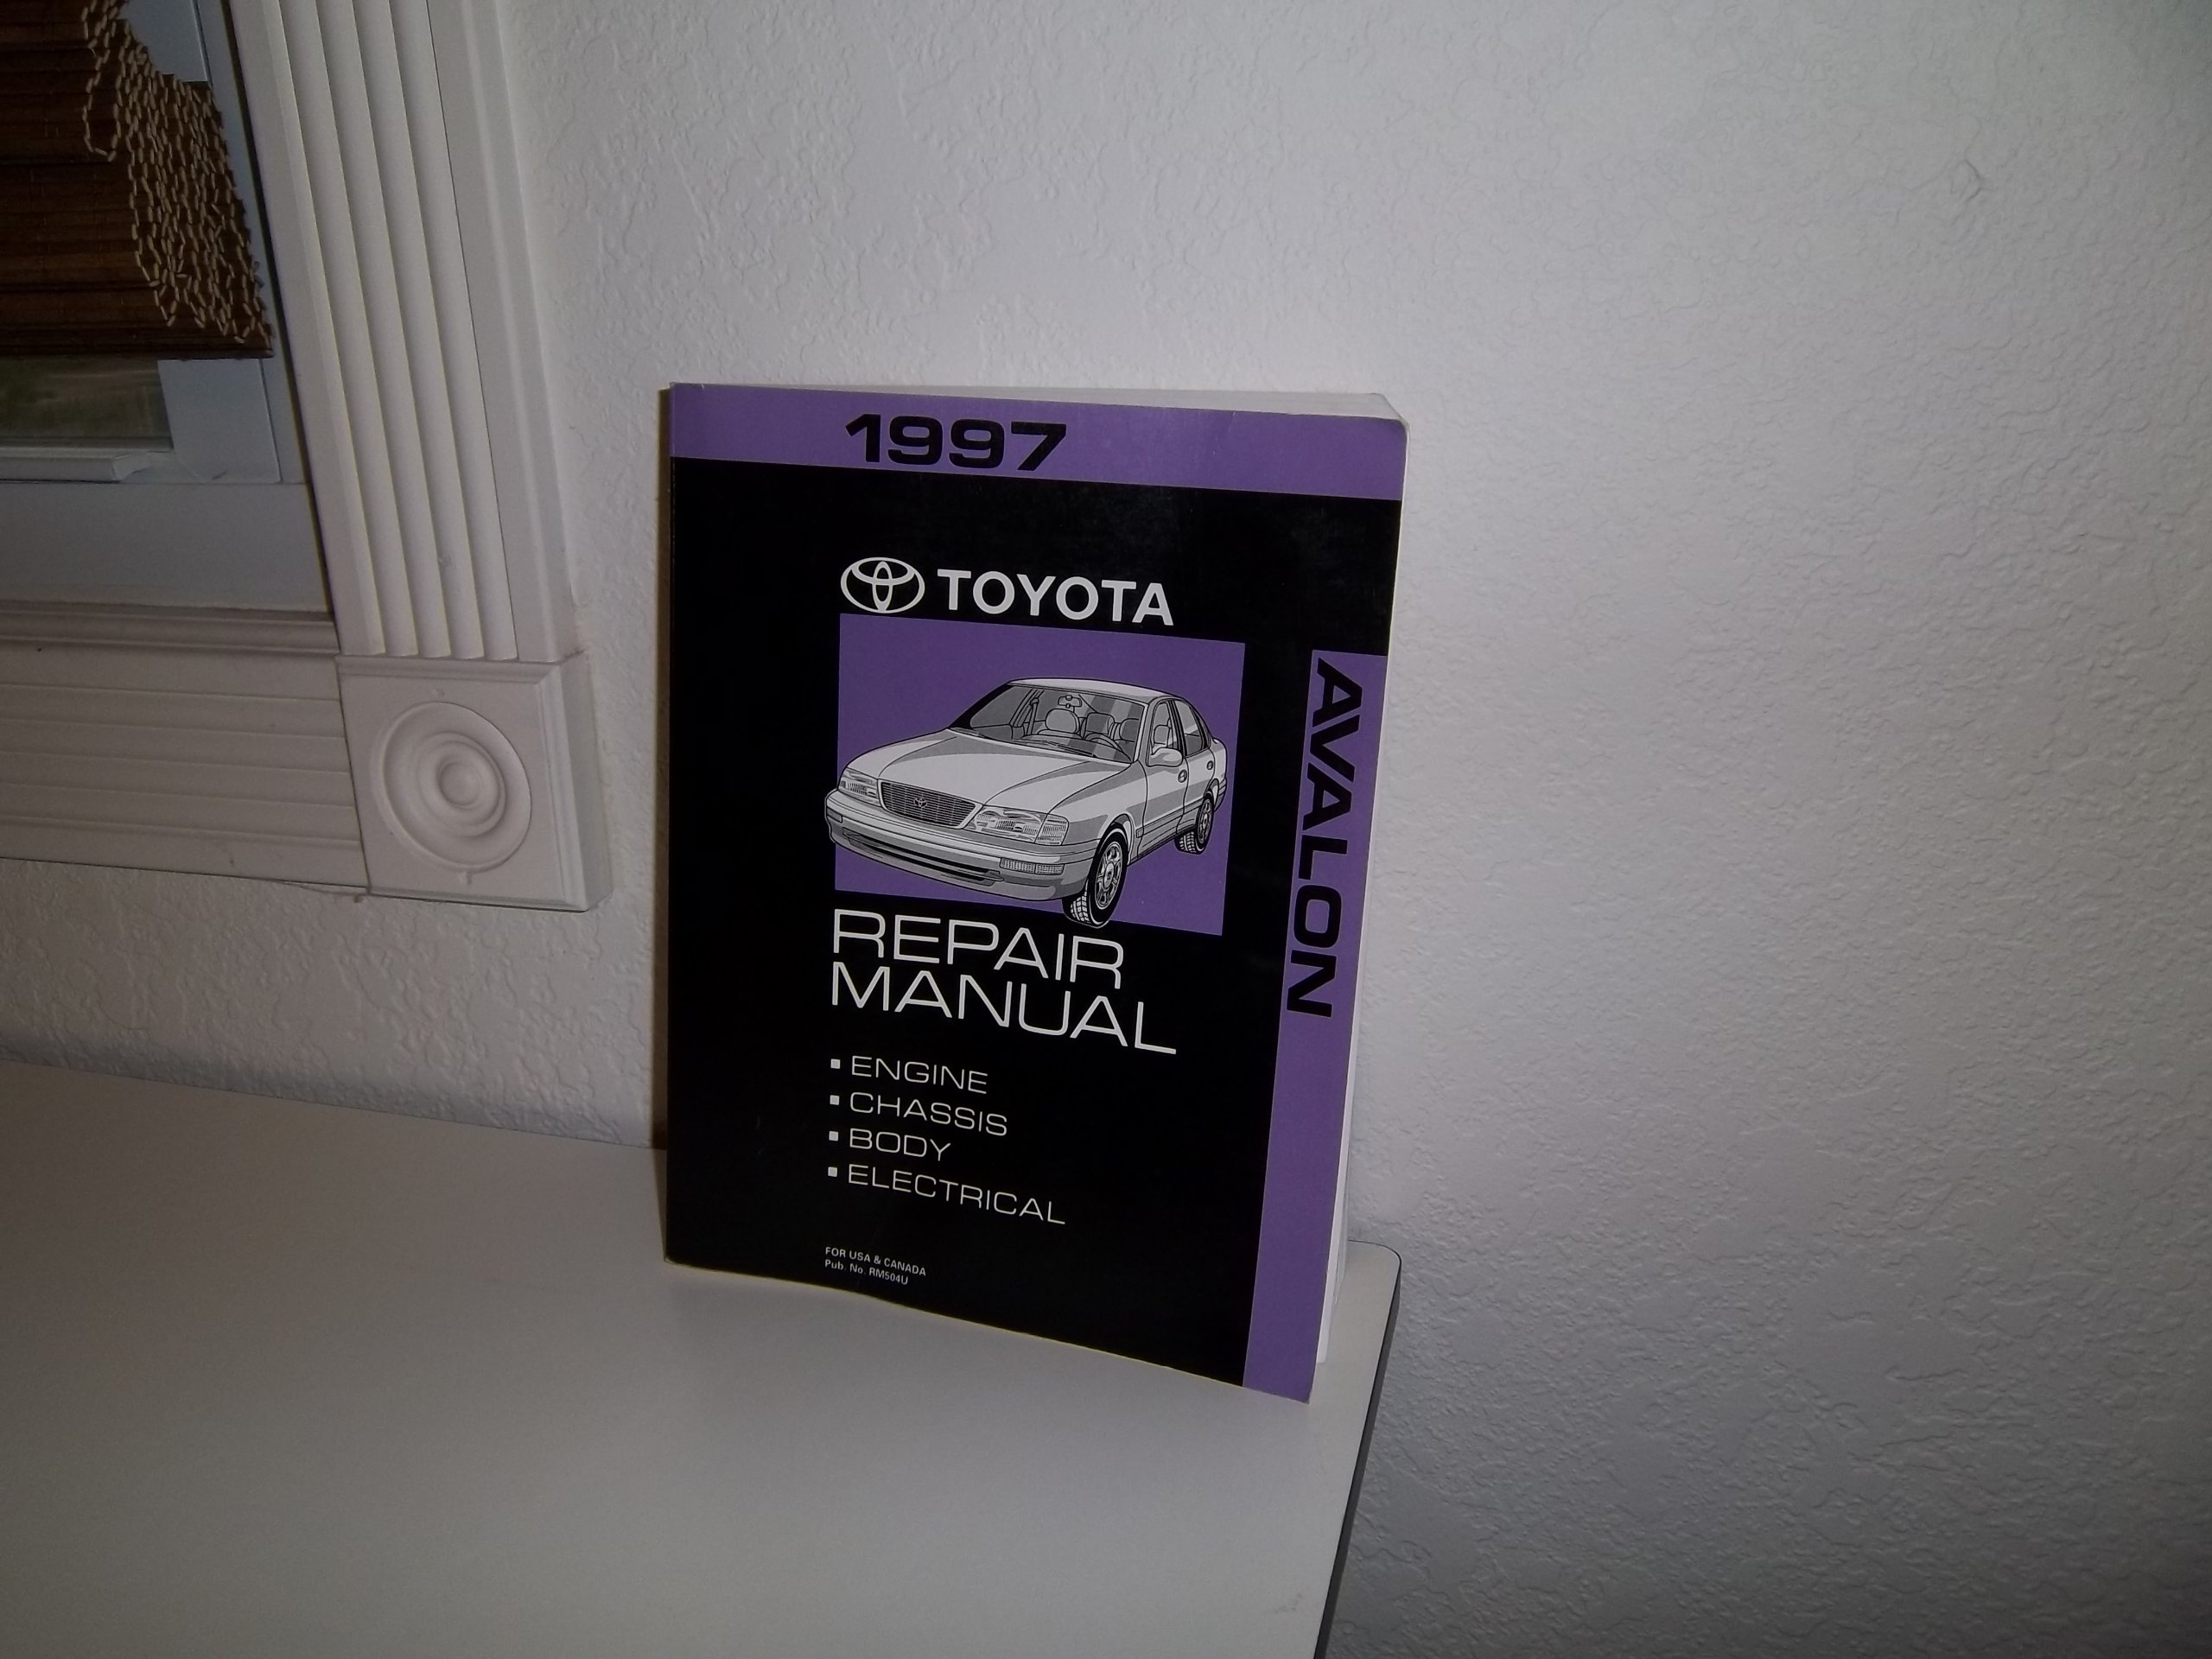 1997 Toyota Avalon Repair Shop Manual Original: Toyota: Amazon.com: Books